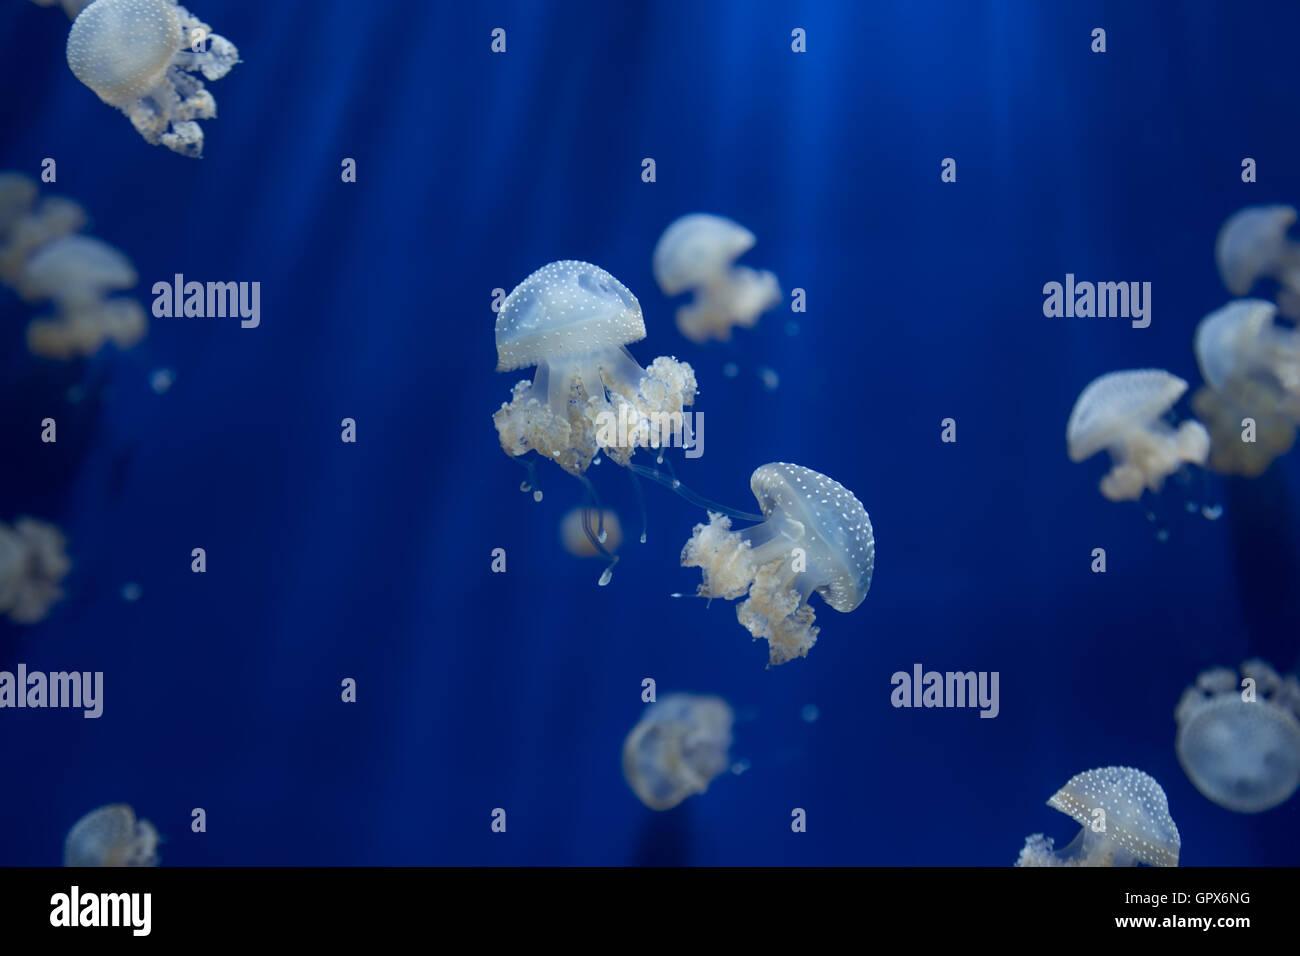 Méduse Méduse Plongée Egypte mer rouge photo Photo Stock